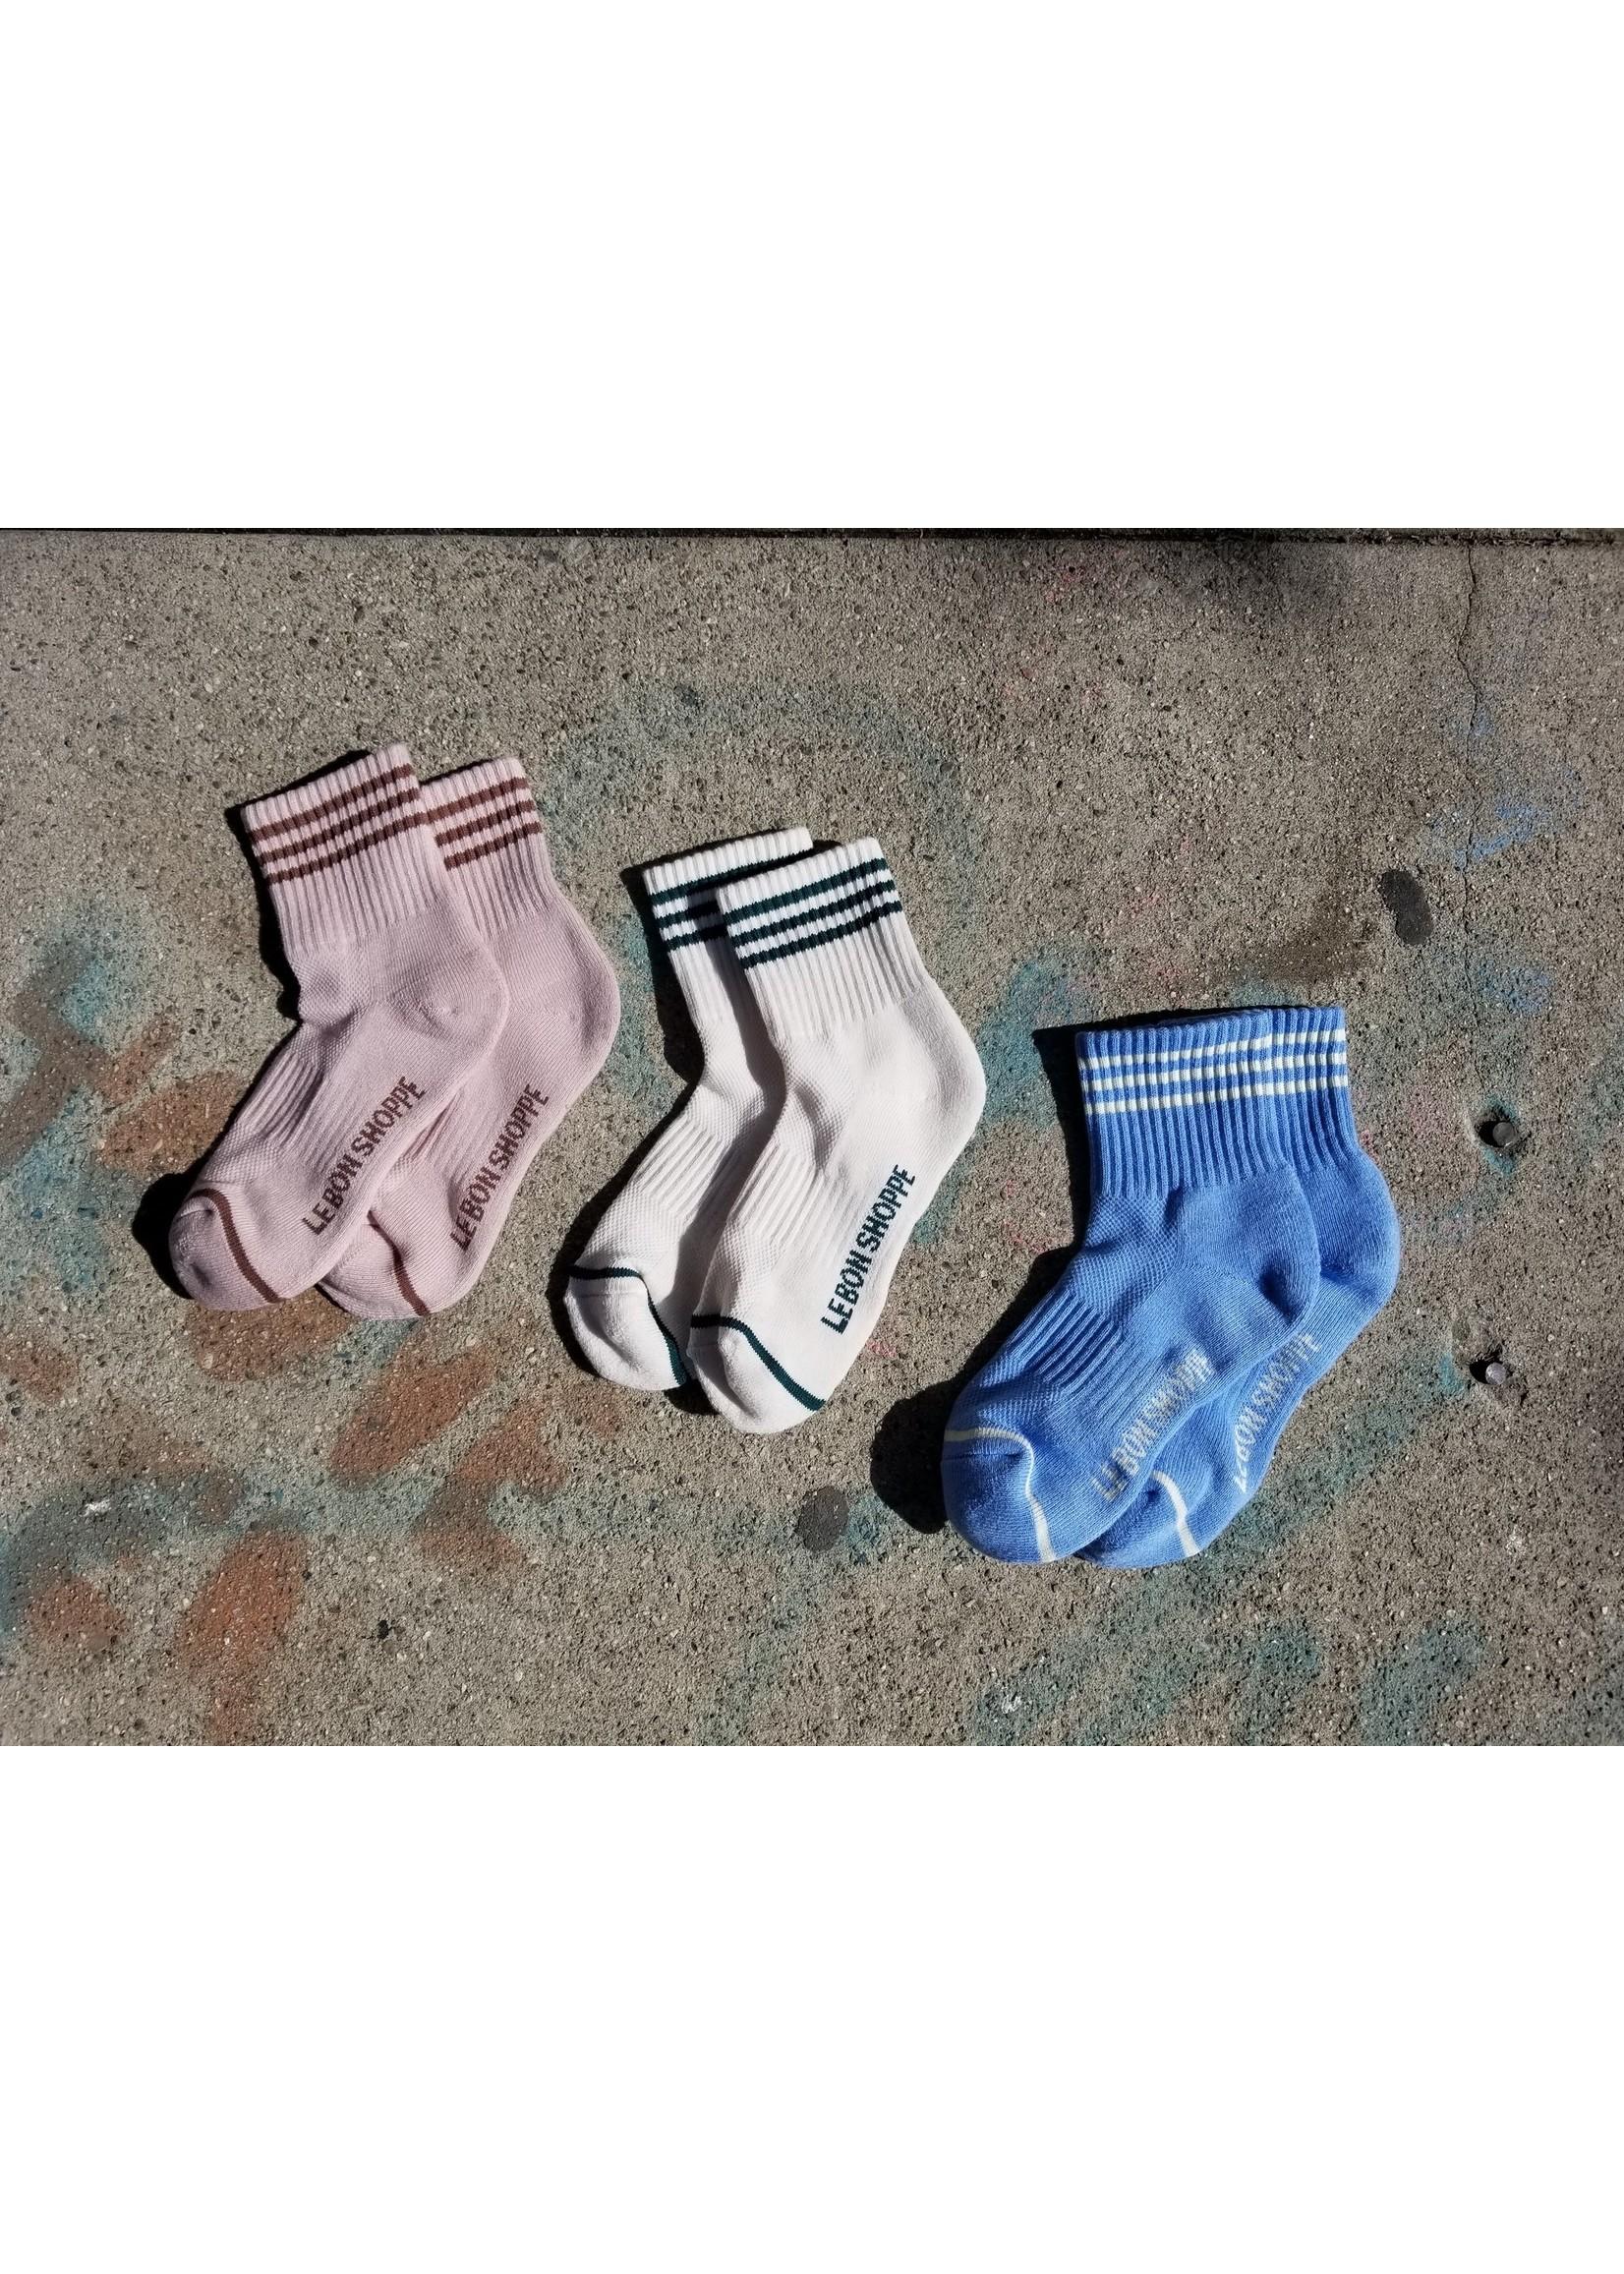 GIRLFRIEND SOCKS PARISIAN BLUE 36-41